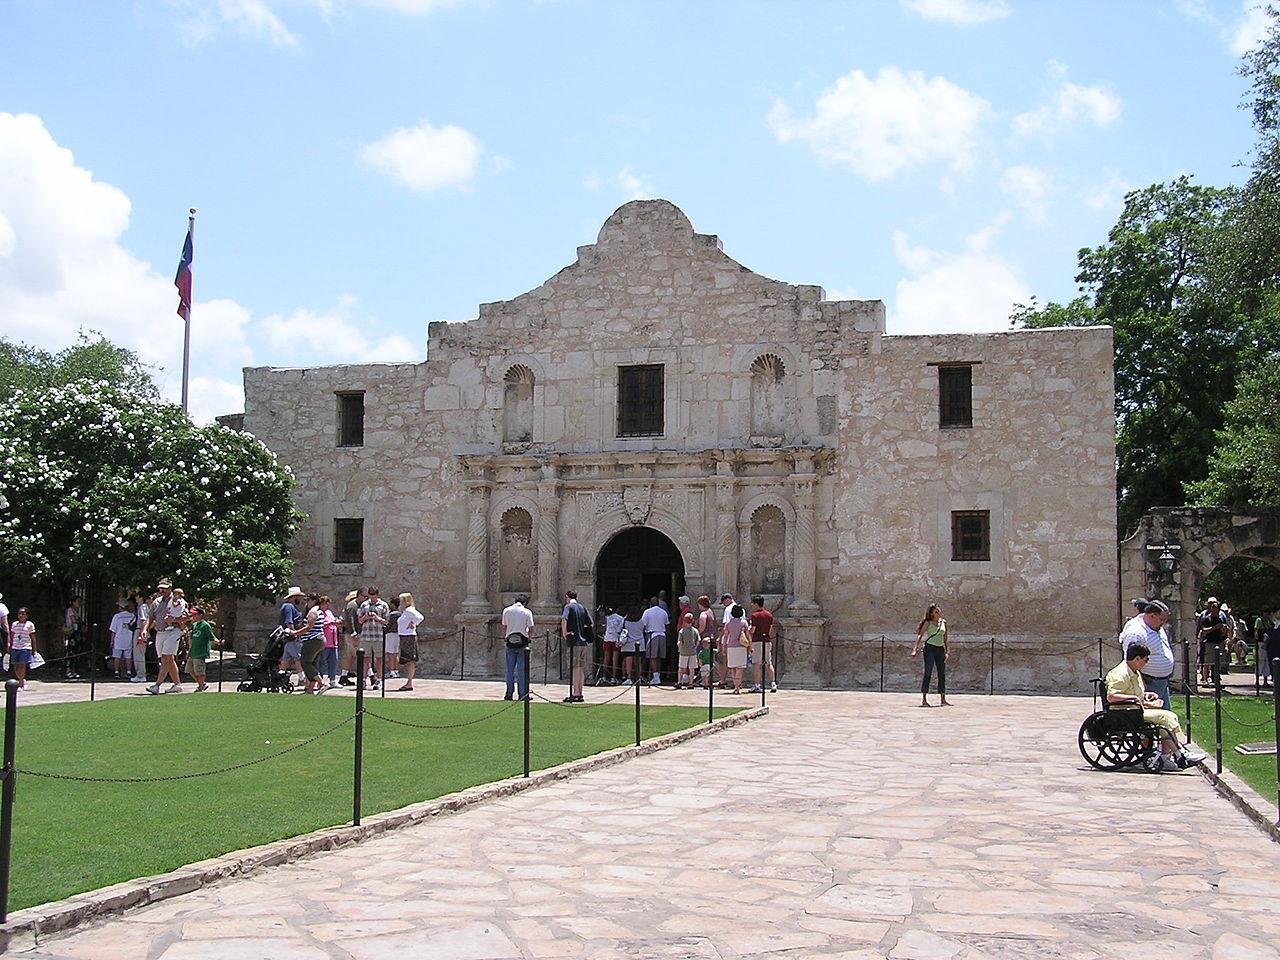 File:San Antonio Texas Alamo.JPG - Wikimedia Commons